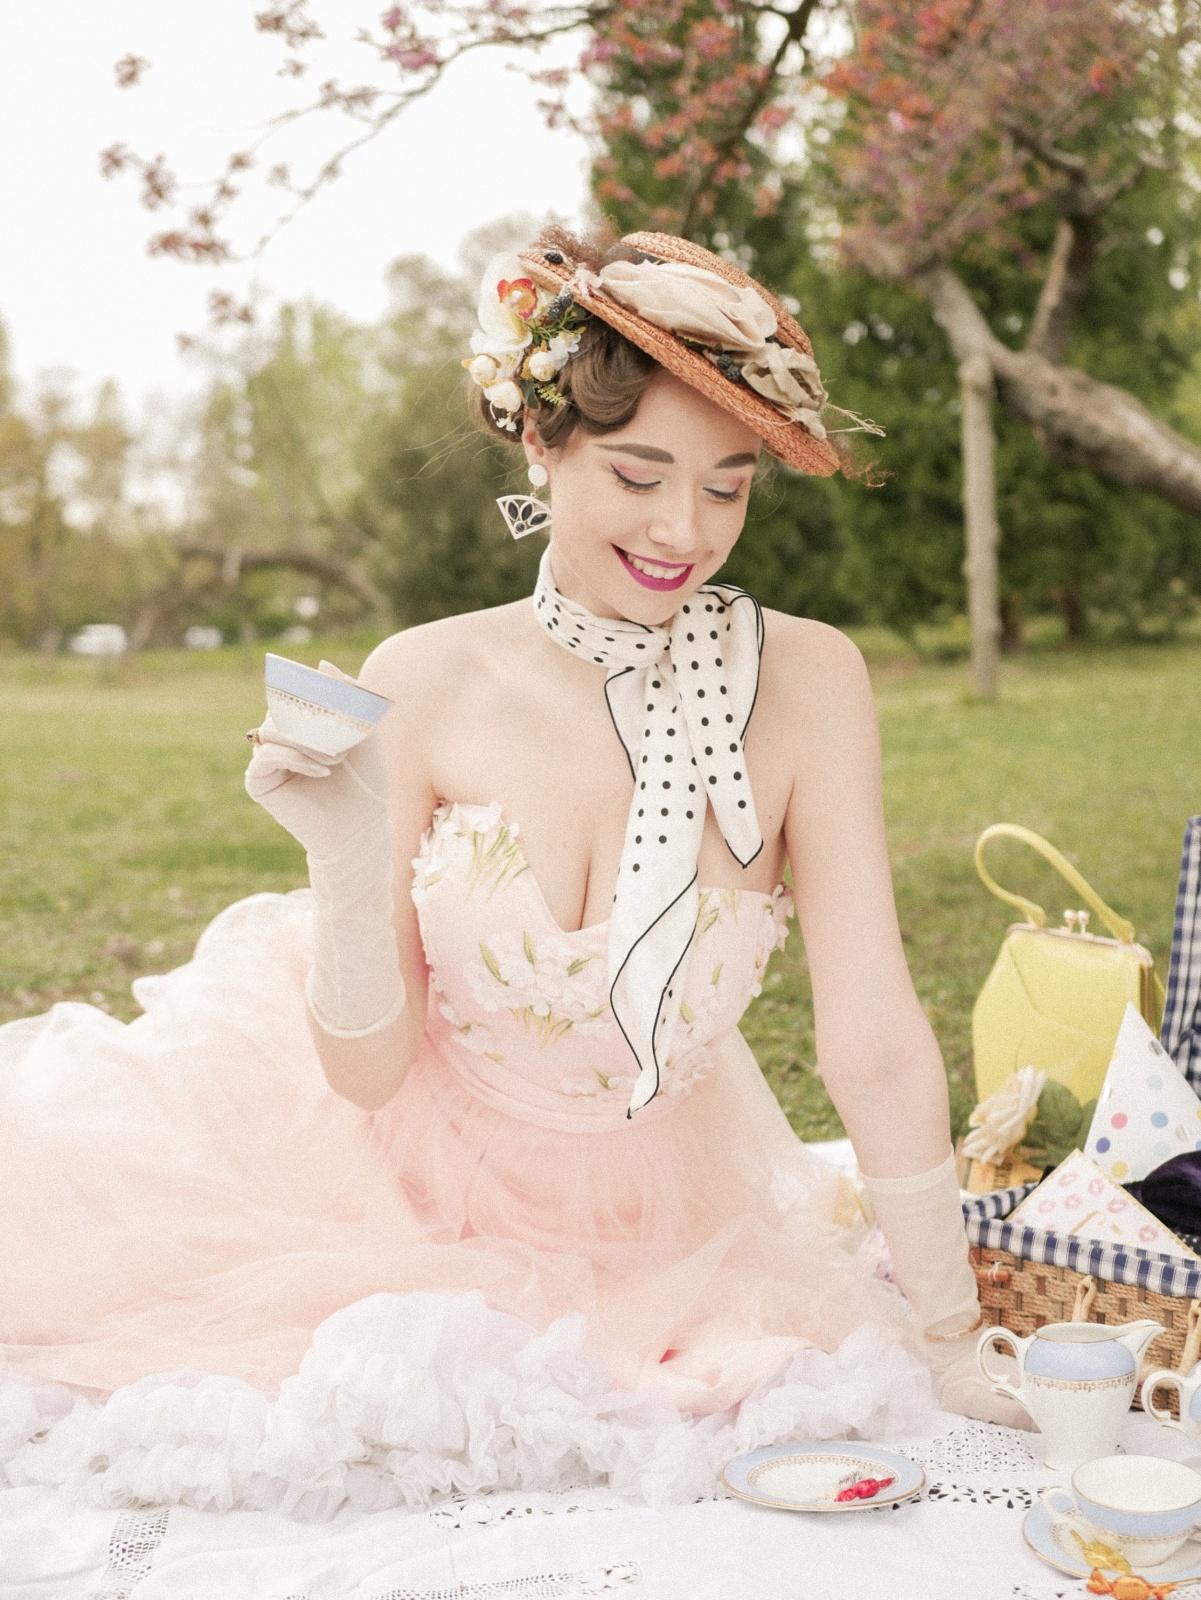 Stella Rose Cherry   Miss Alba Banana   24981   27467 (4) jpeg